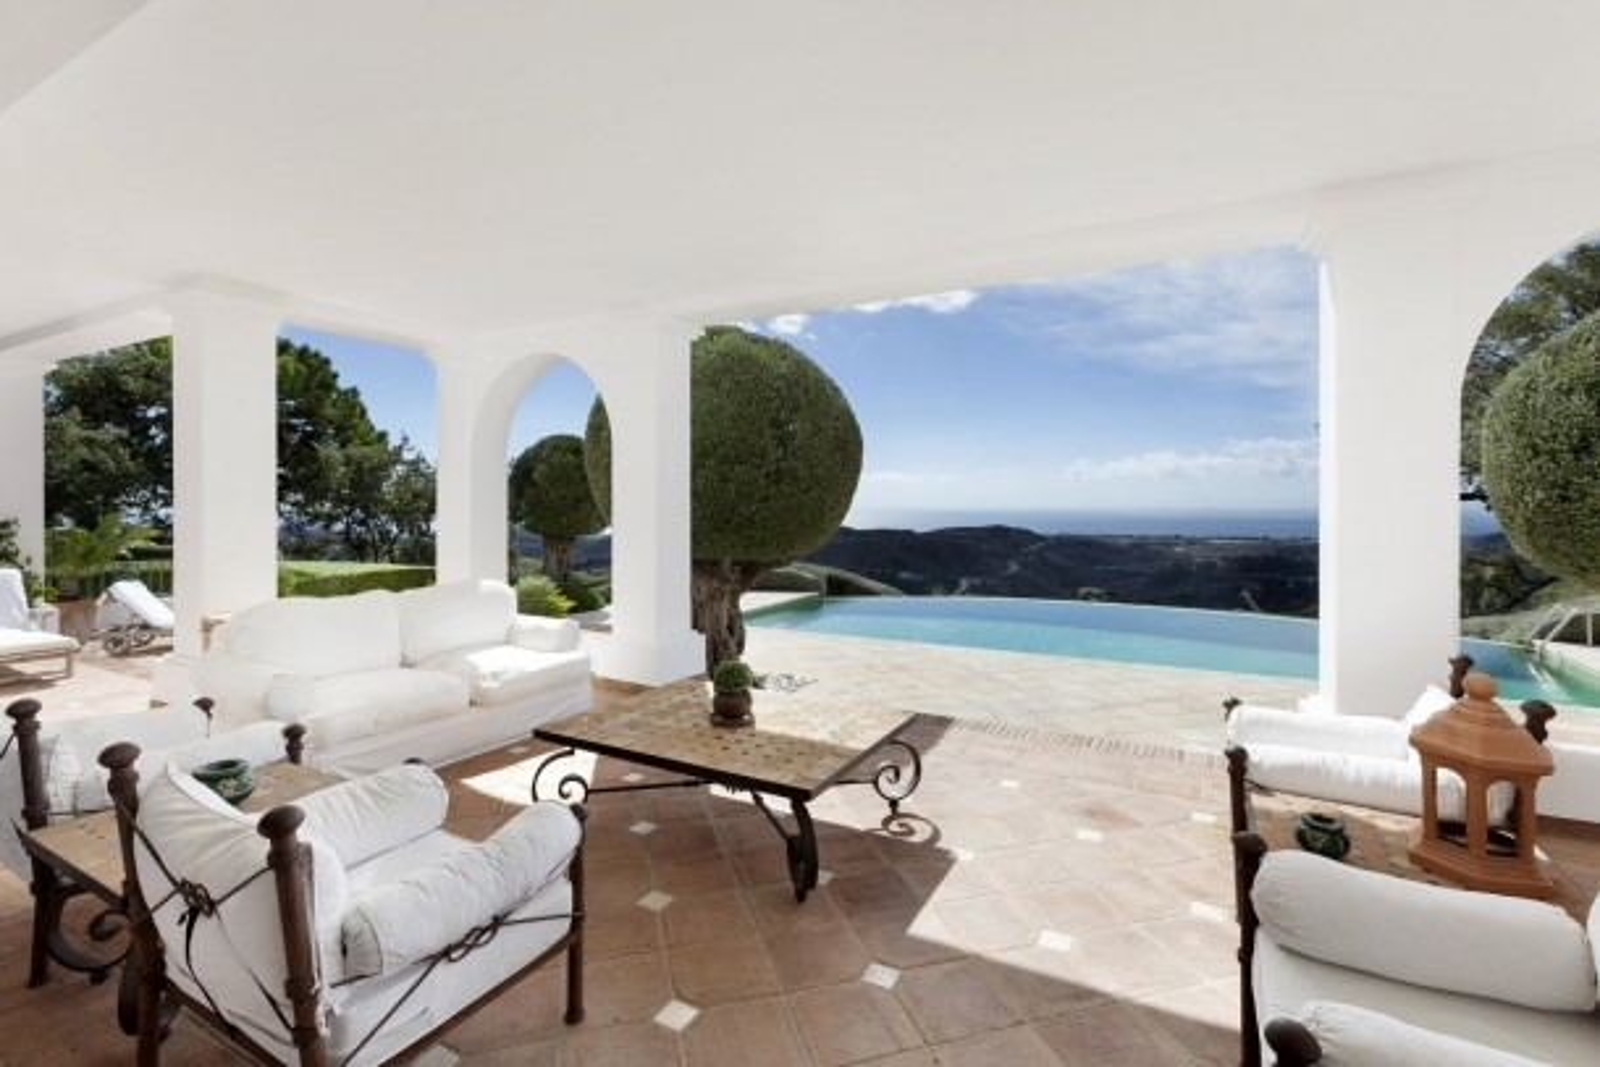 Spain's buoyant property sales